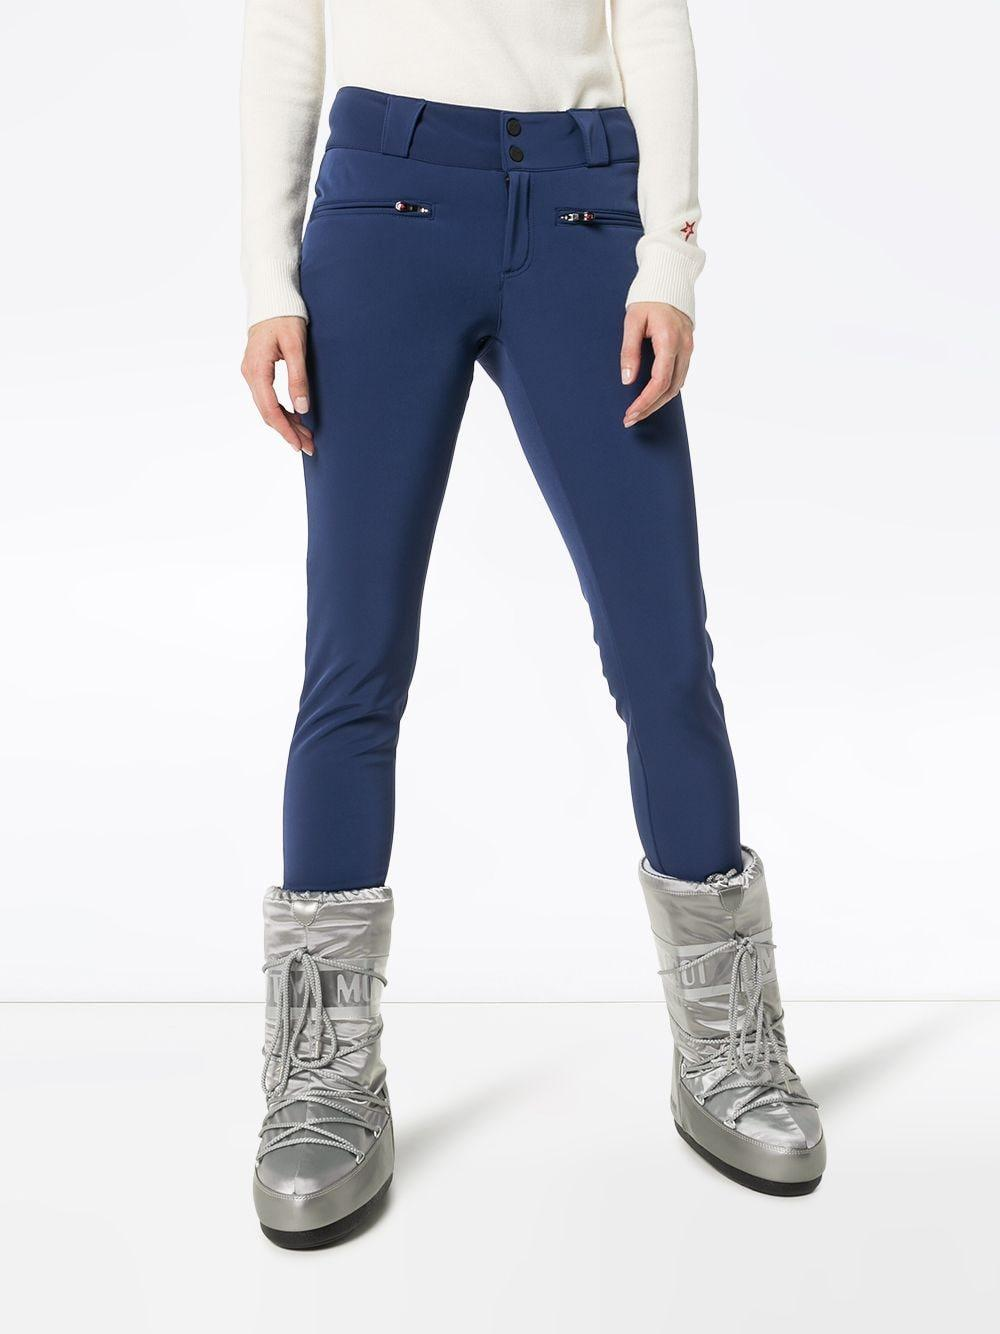 Perfect Moment 'Aurora' Skinny-Skihose in Blau